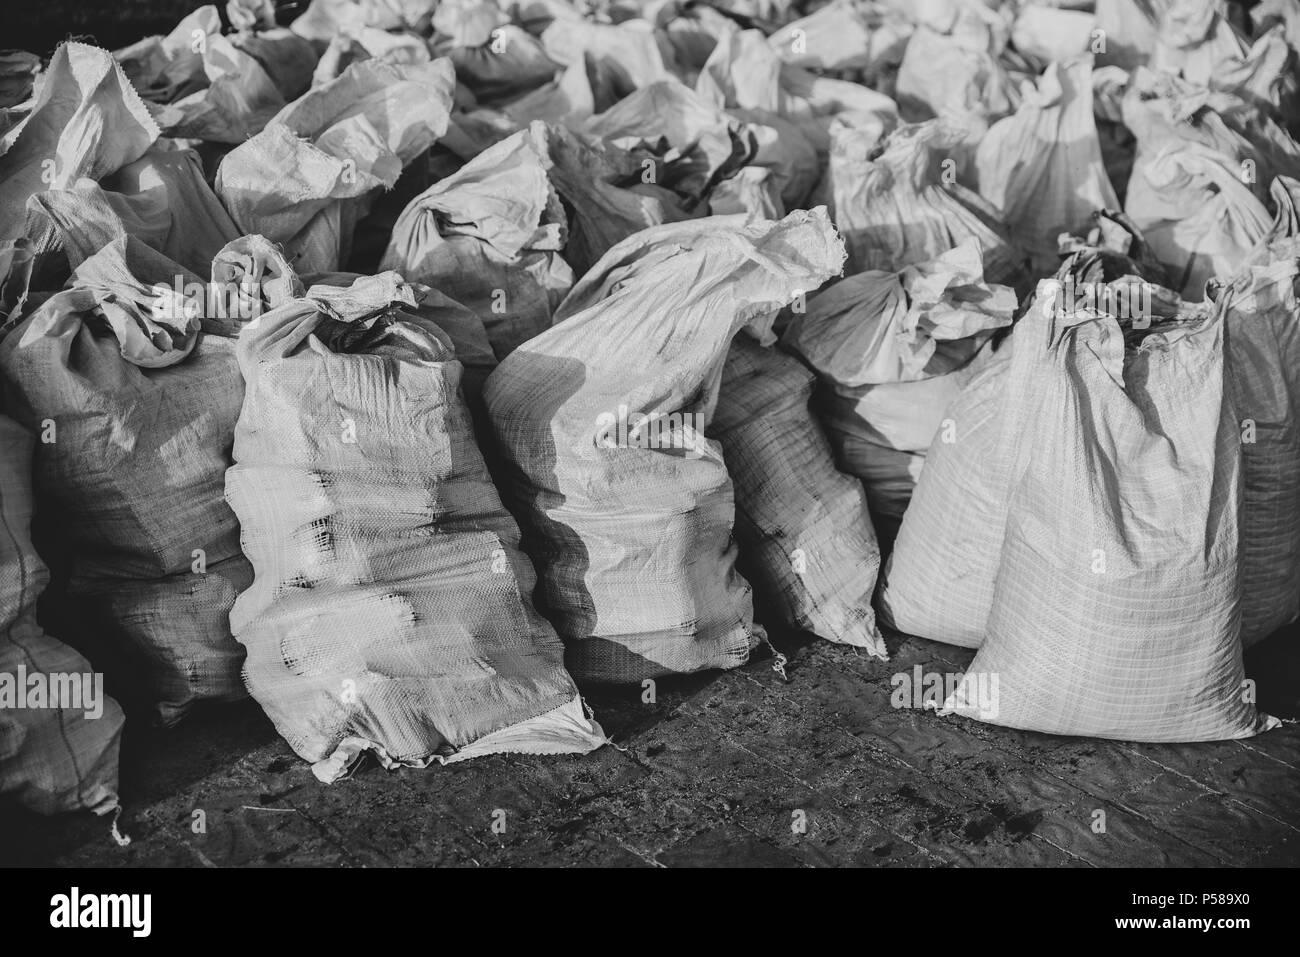 Group of filled plastic woven sacks, polypropylene bags - Stock Image